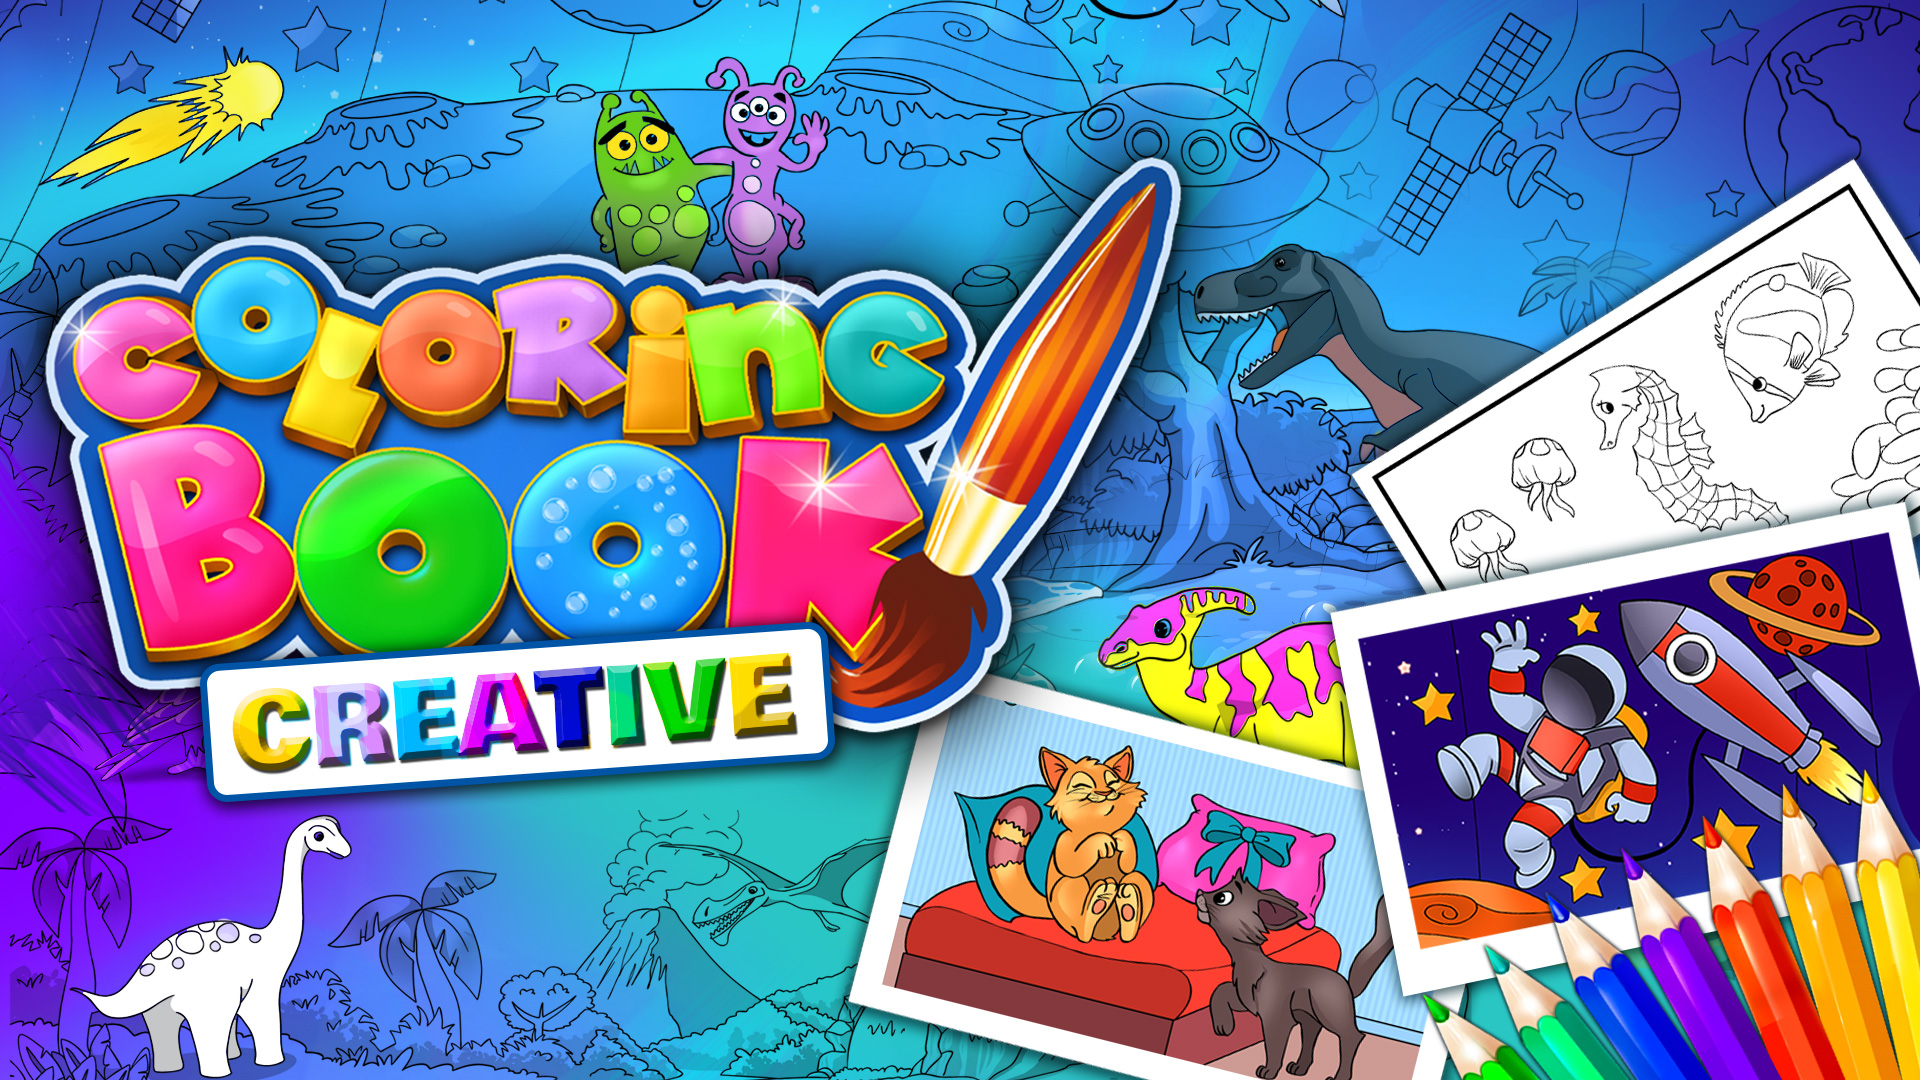 Coloring Book Creative Edition//Nintendo Switch/Nintendo